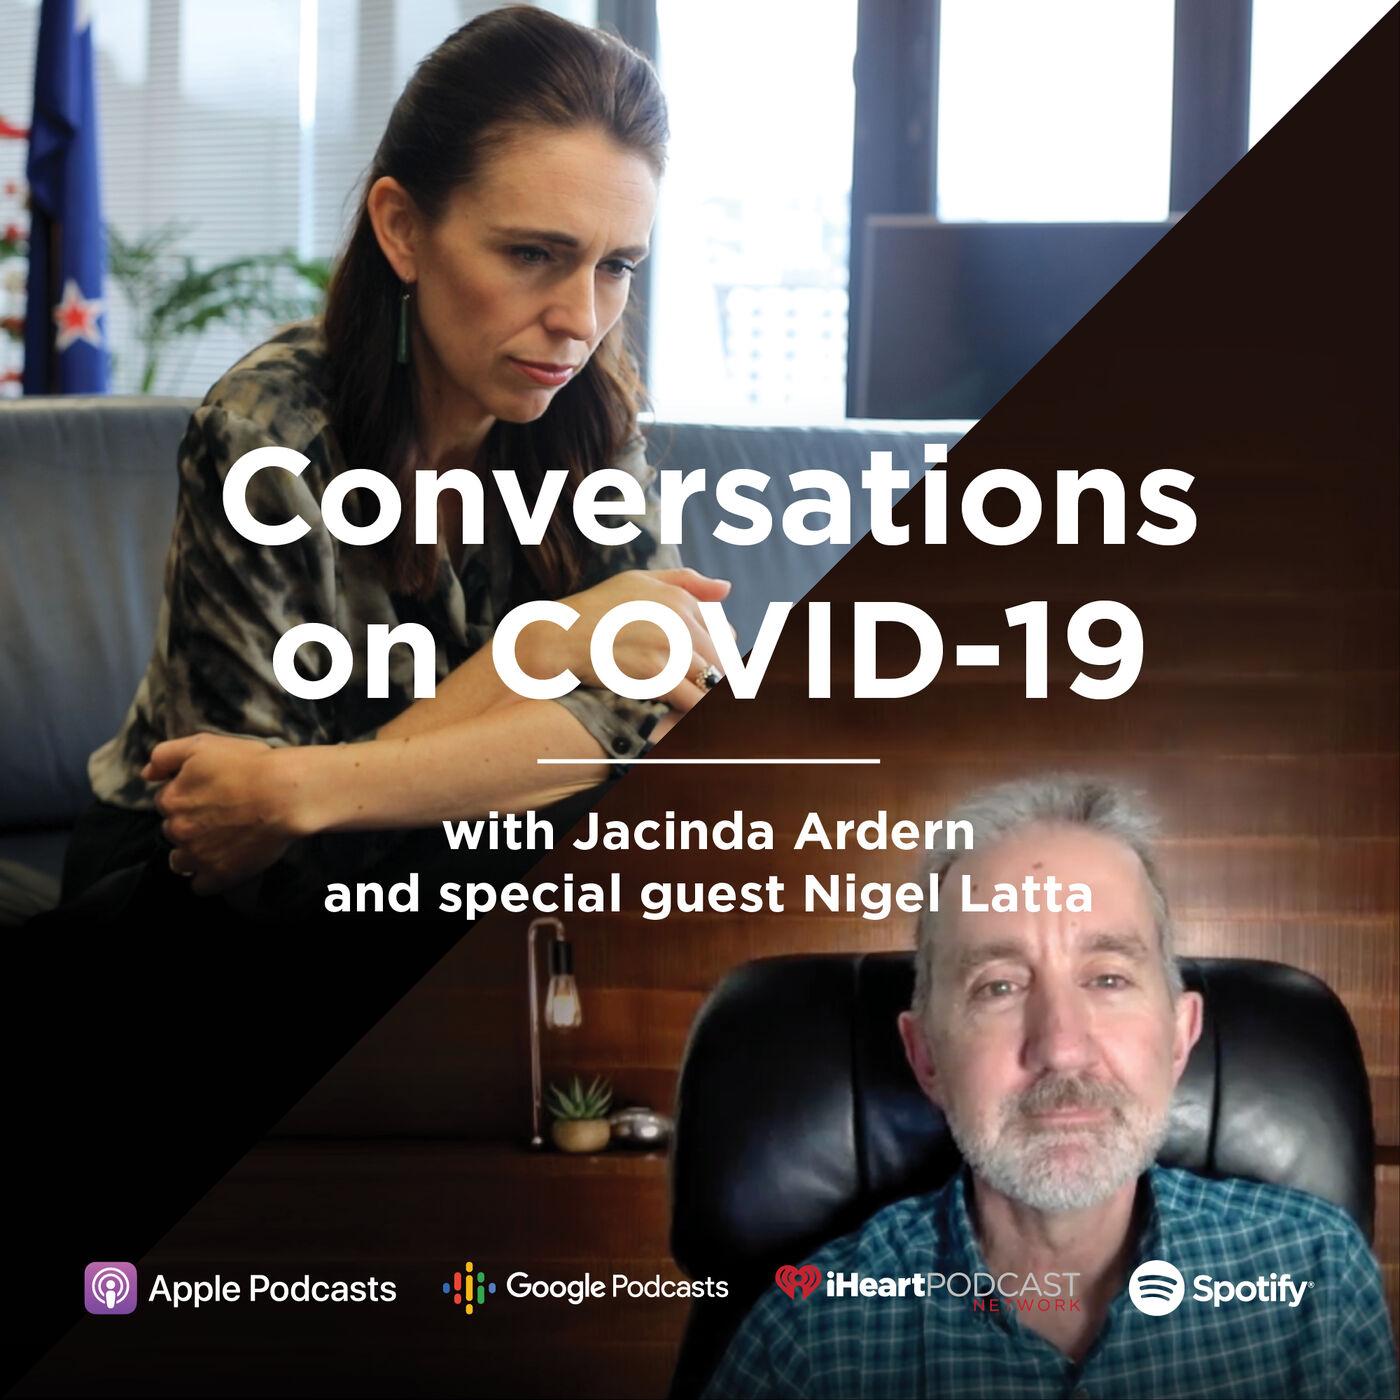 Prime Minister Jacinda Ardern talks with Nigel Latta